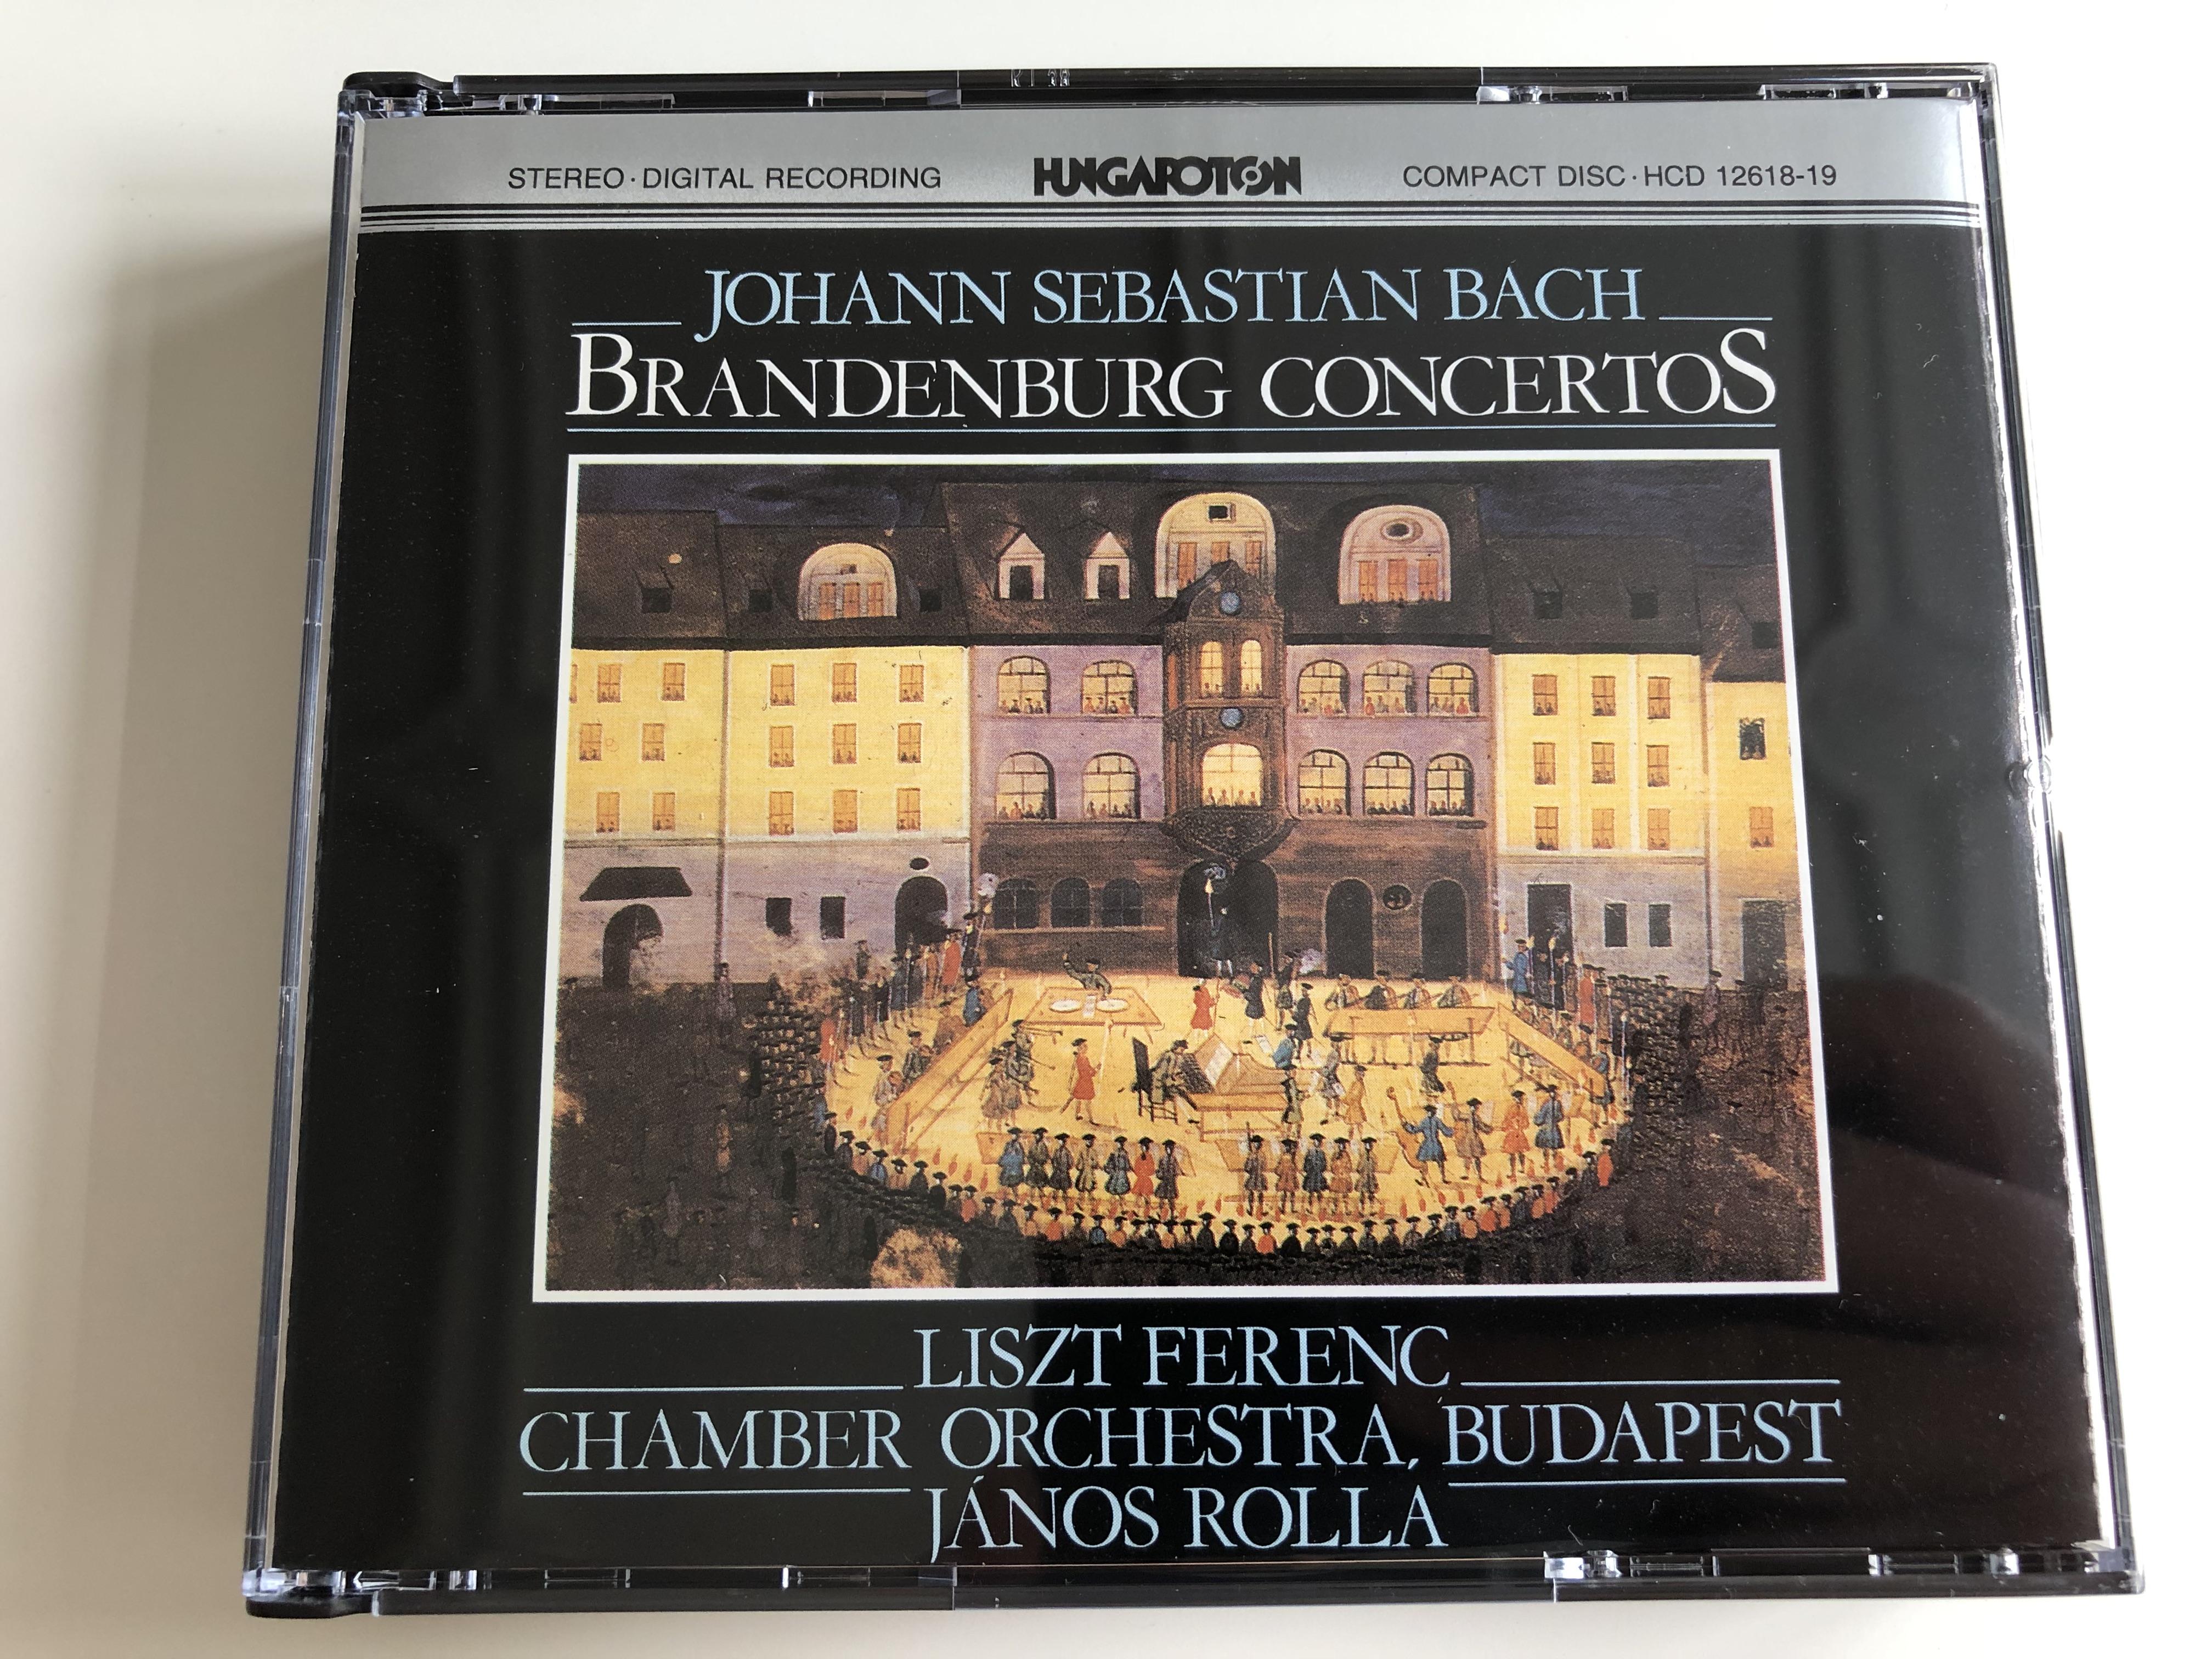 johann-sebastian-bach-brandenburg-concertos-2cd-liszt-ferenc-chamber-orchestra-conducted-by-j-nos-rolla-hungaroton-hcd-12618-19-1-.jpg